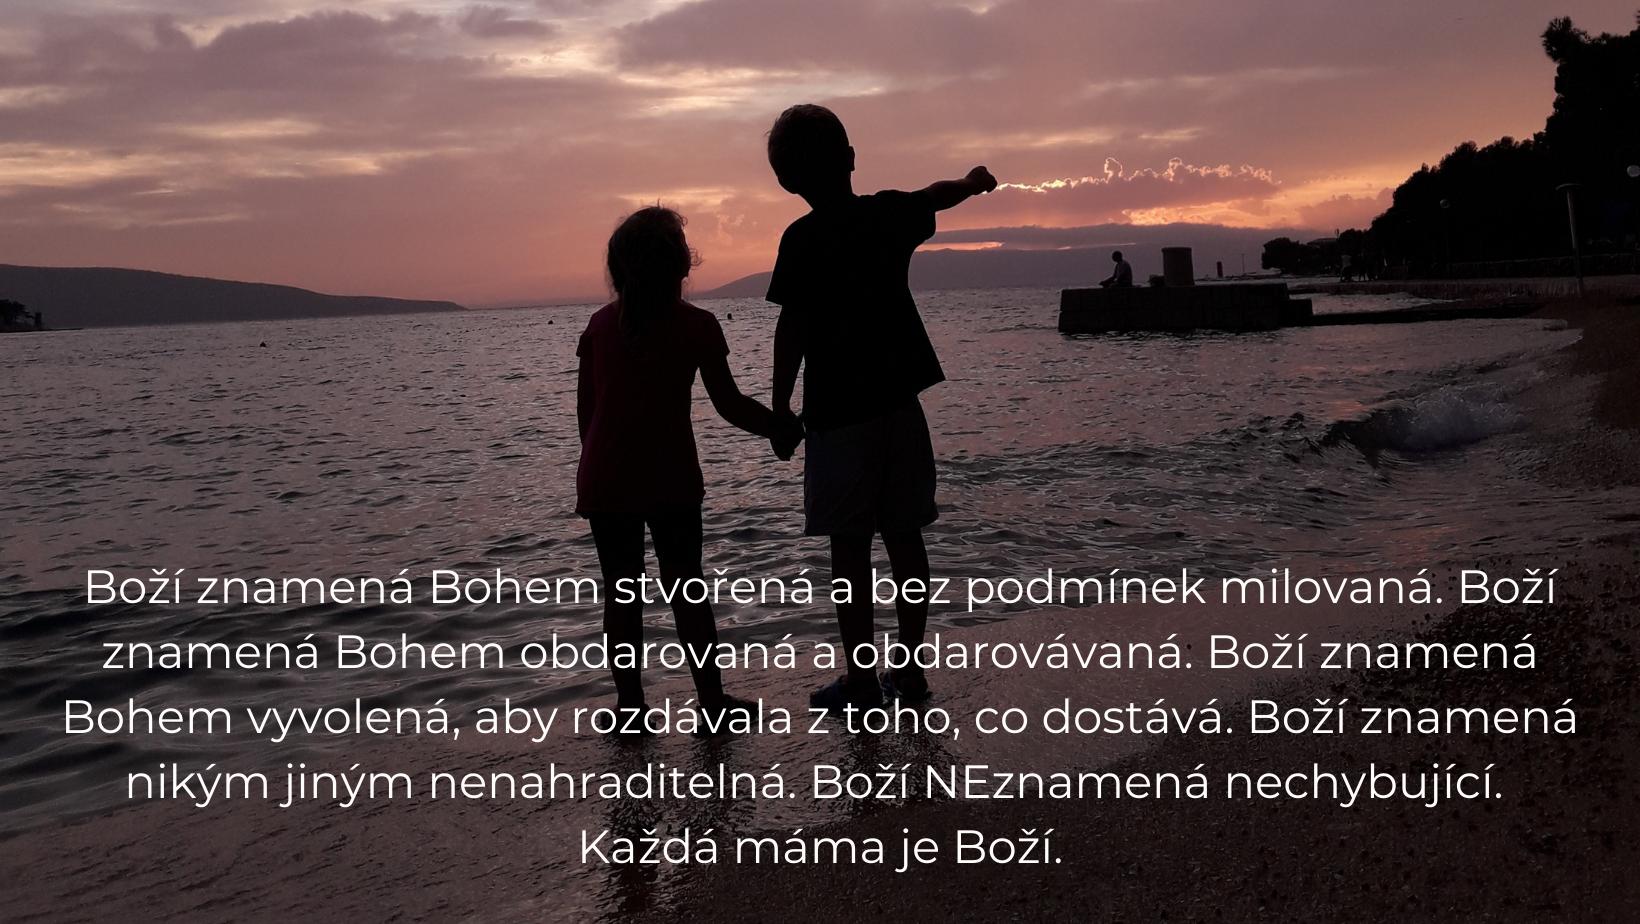 bozimama.cz